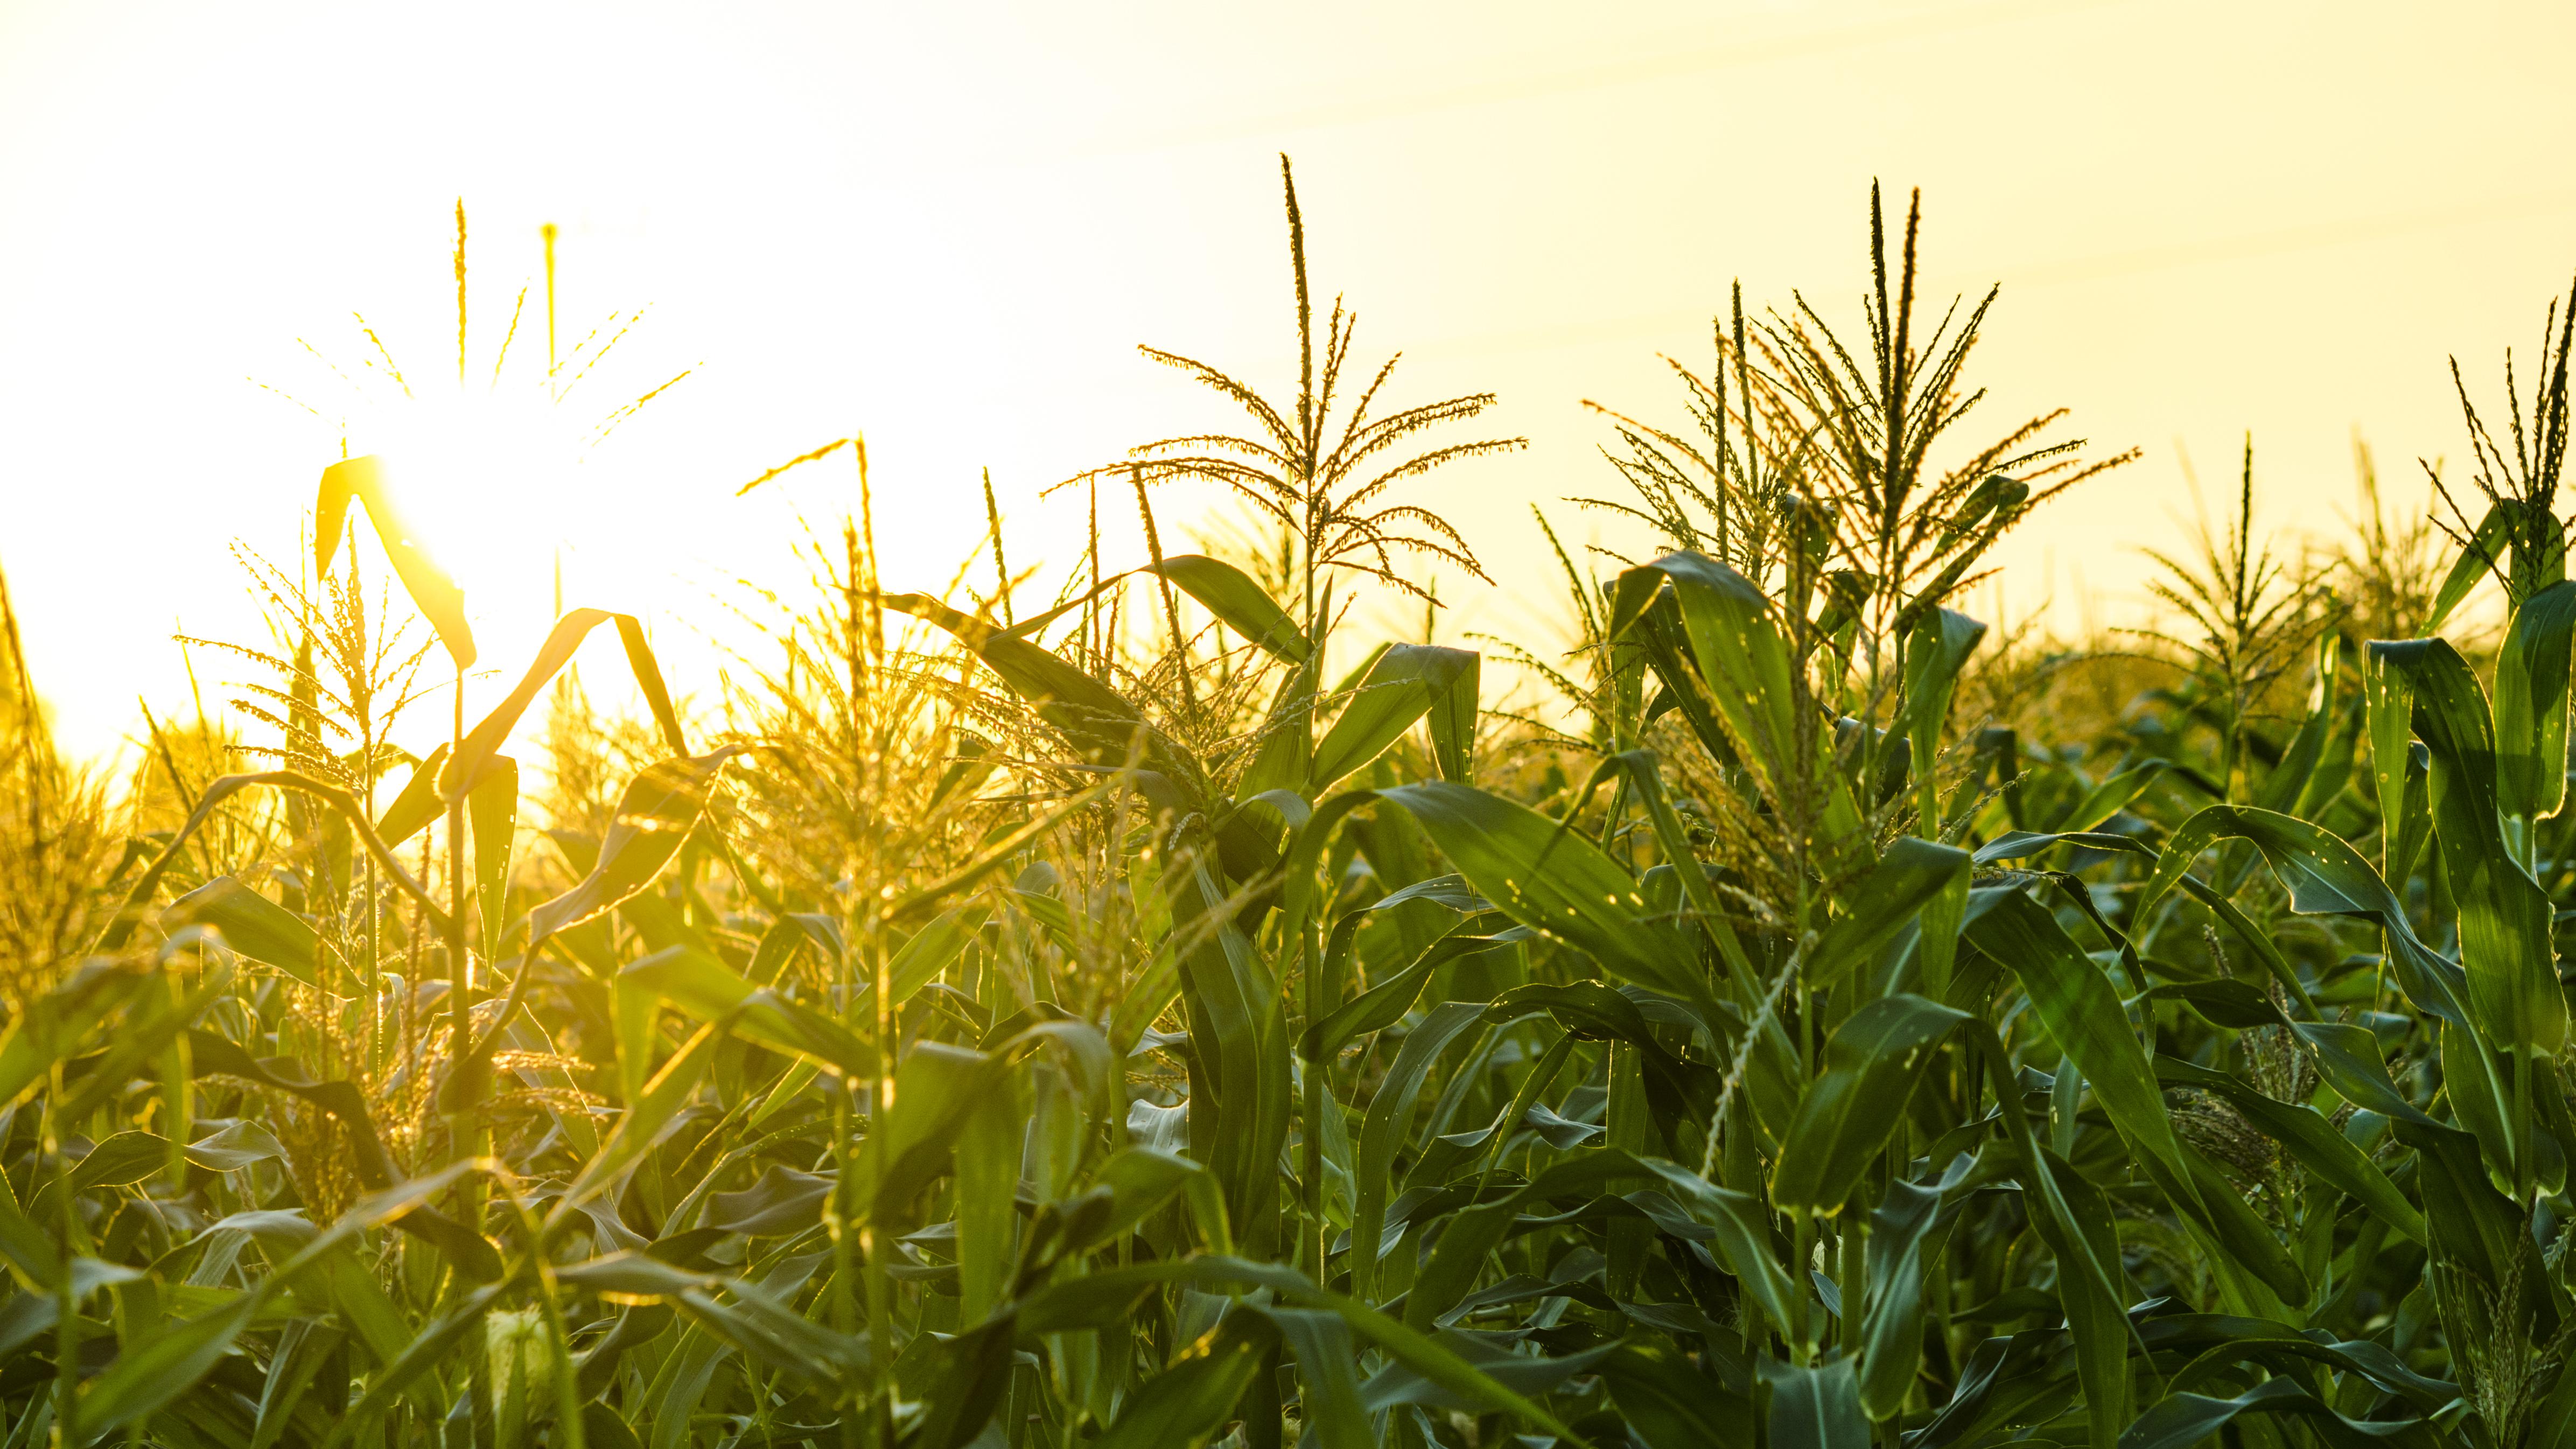 Pictured is a cornfield. SHUTTERSTOCK/ TB studio